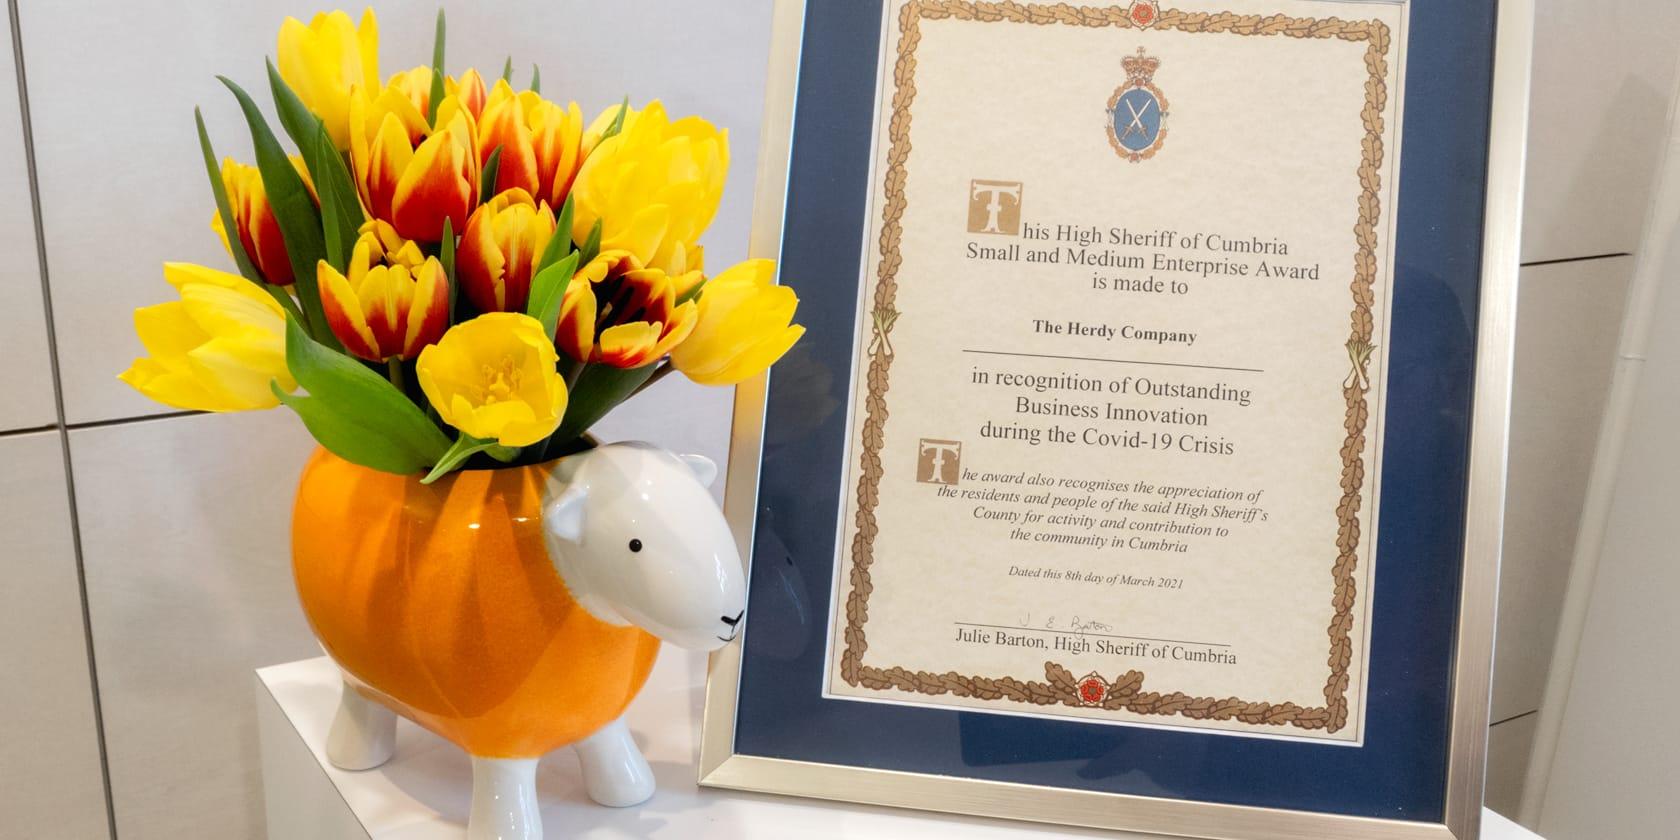 Herdy Wins High Sheriff of Cumbria's Small & Medium Enterprise Award